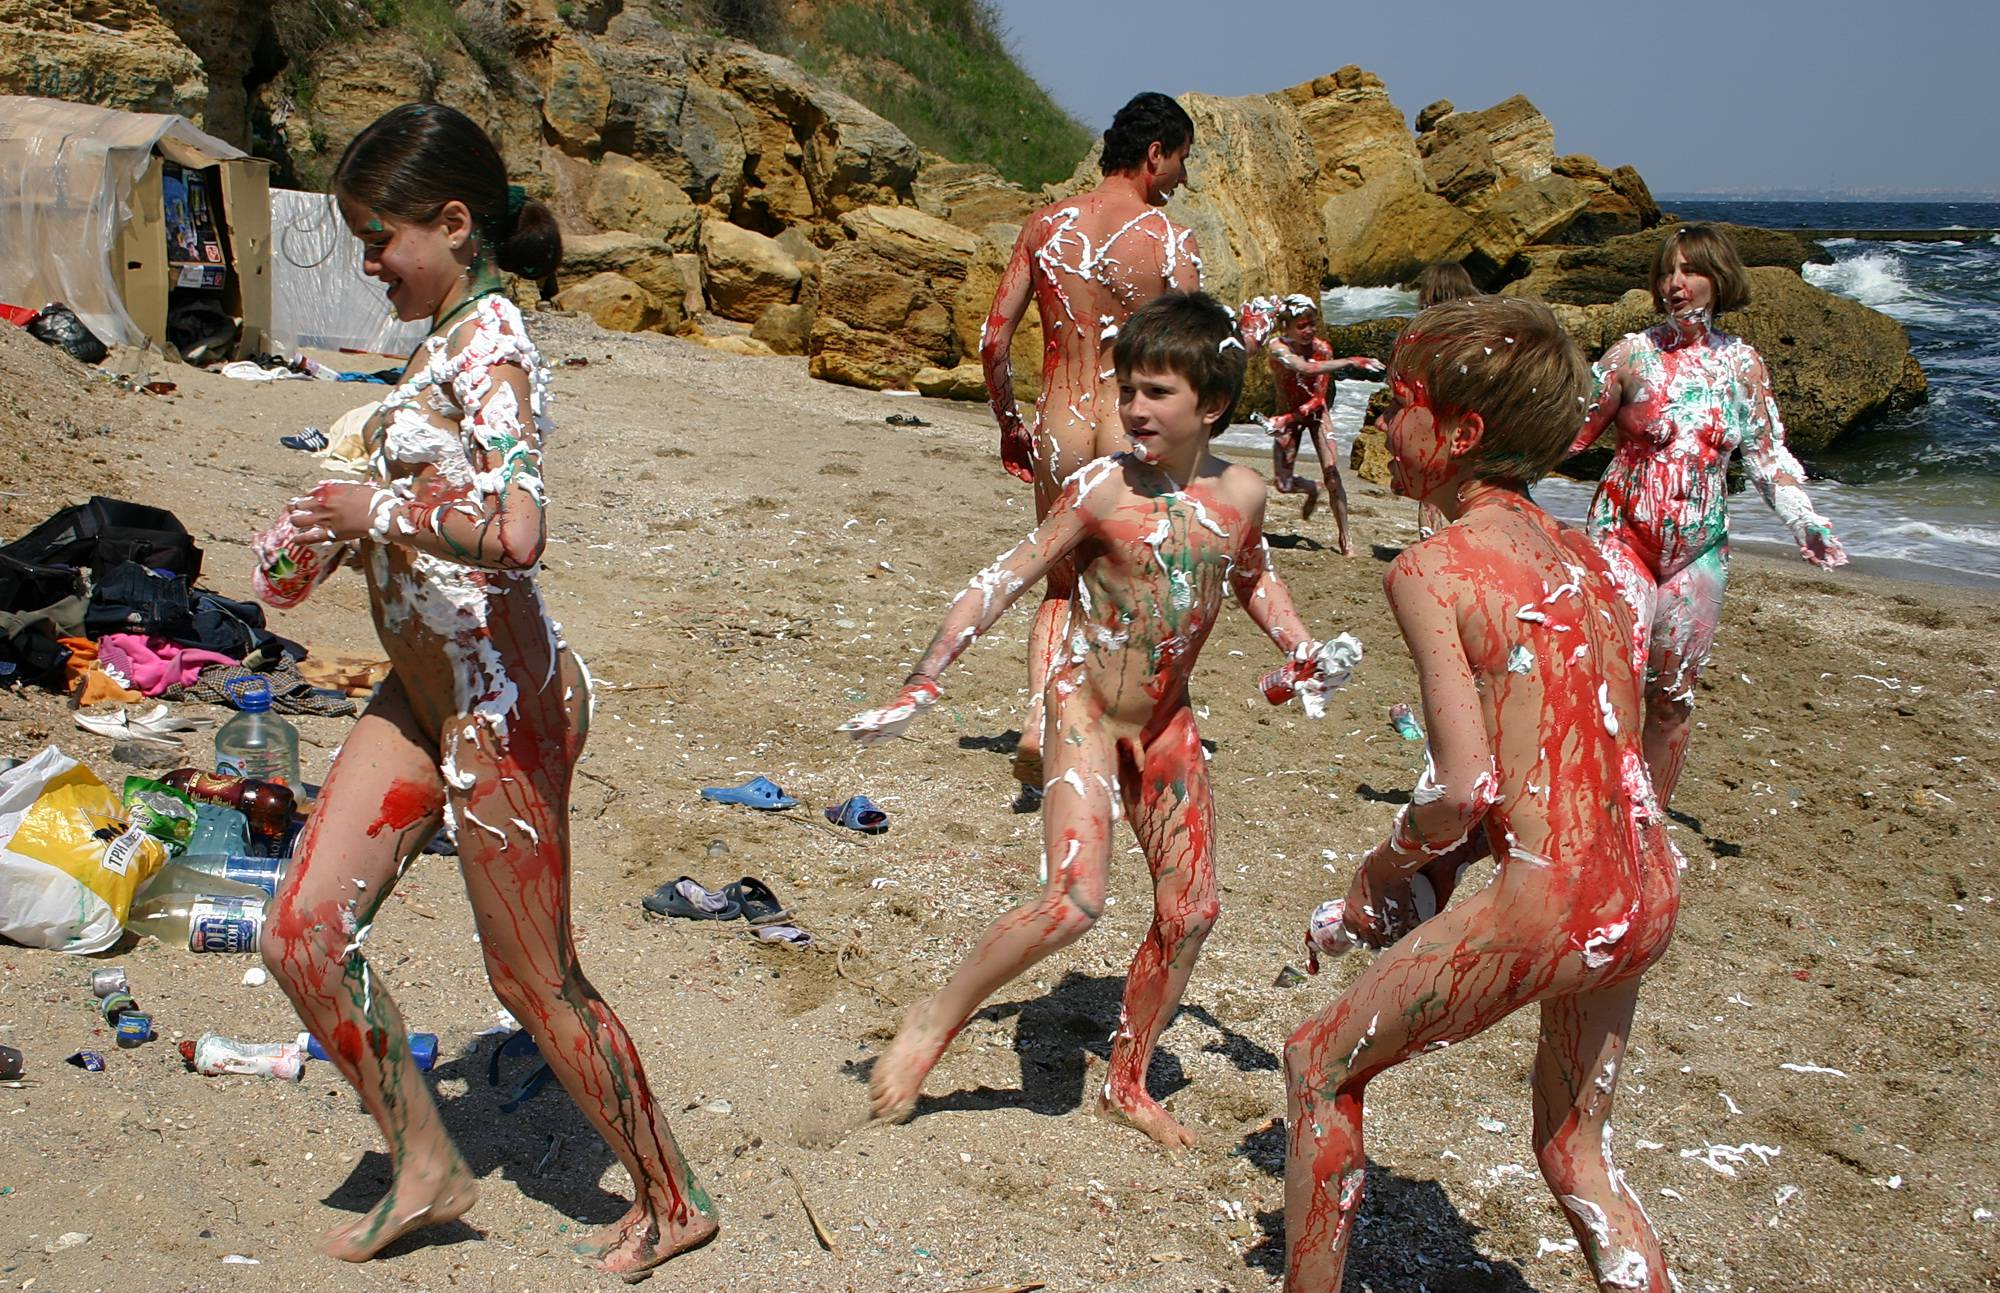 Nudist Pics Black Sand Body Painting - 2